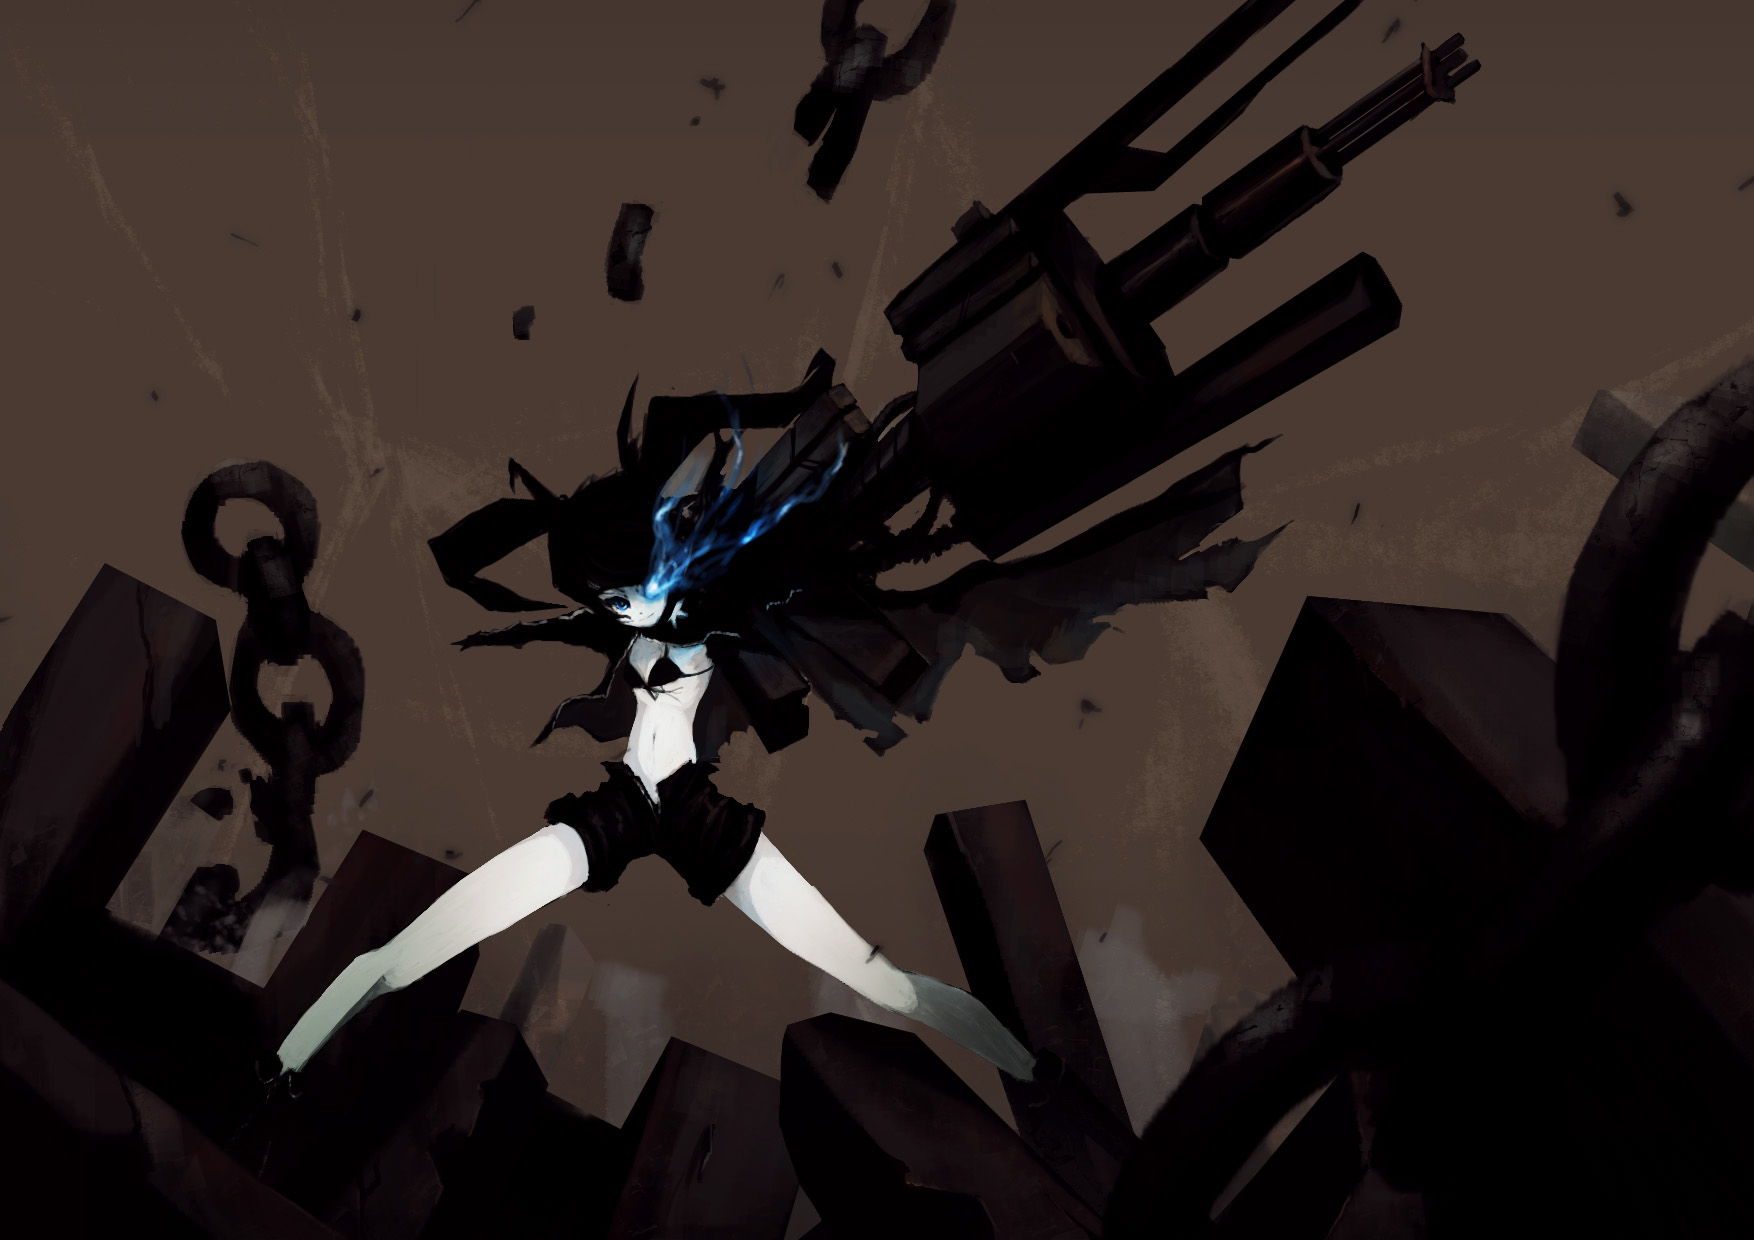 Anime - Black Rock Shooter  Wallpaper